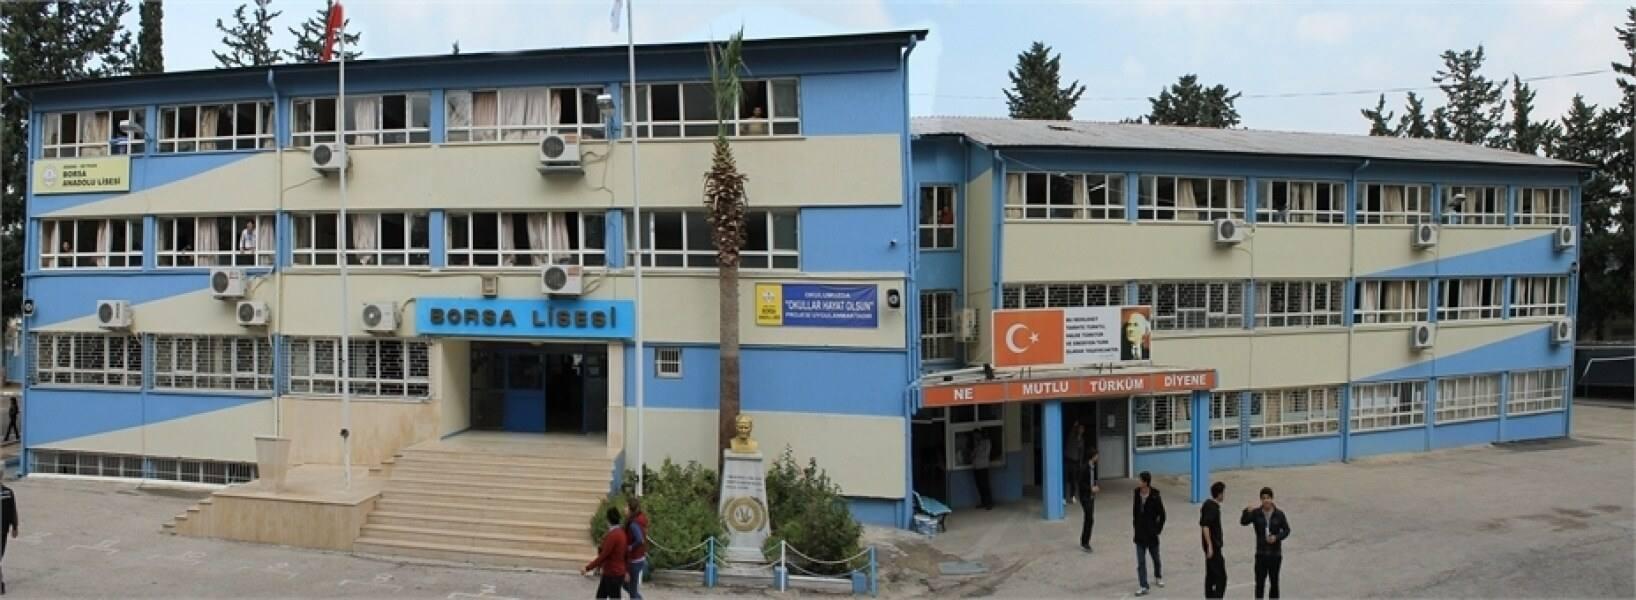 Adana Borsa Lisesi